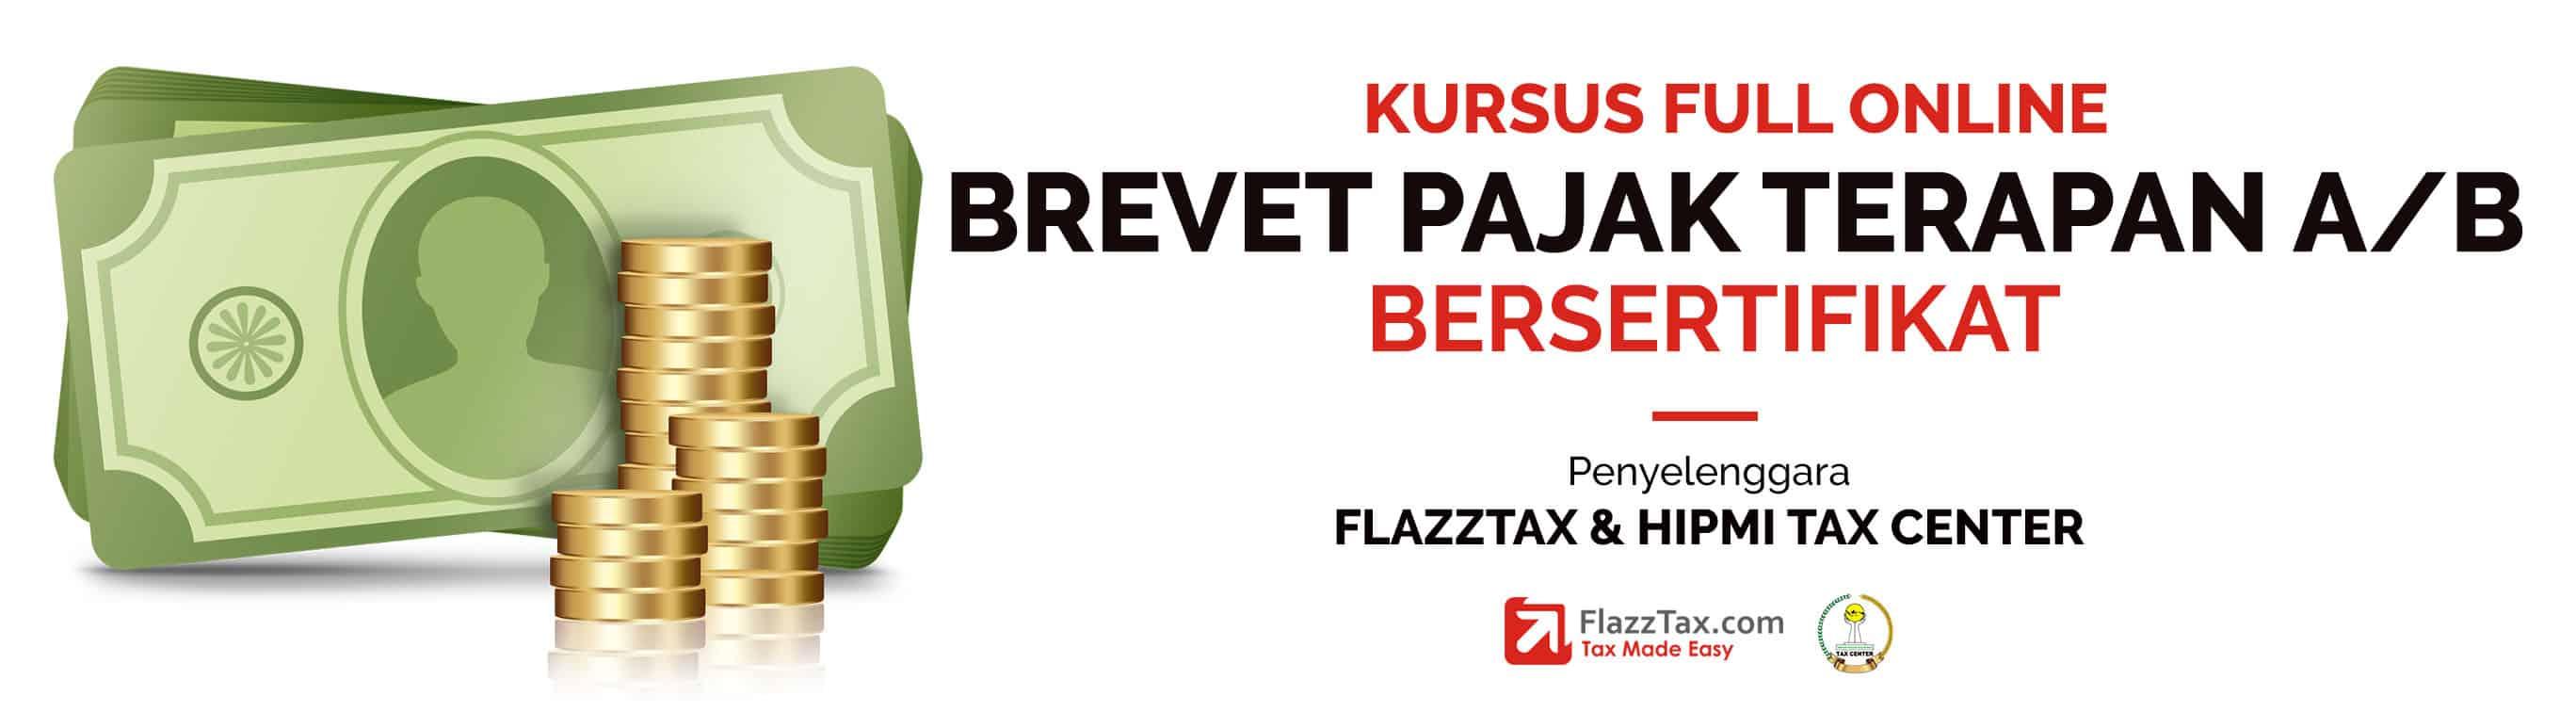 promo image kursus online brevet pajak ab arkademi flazztax hipmi tax center